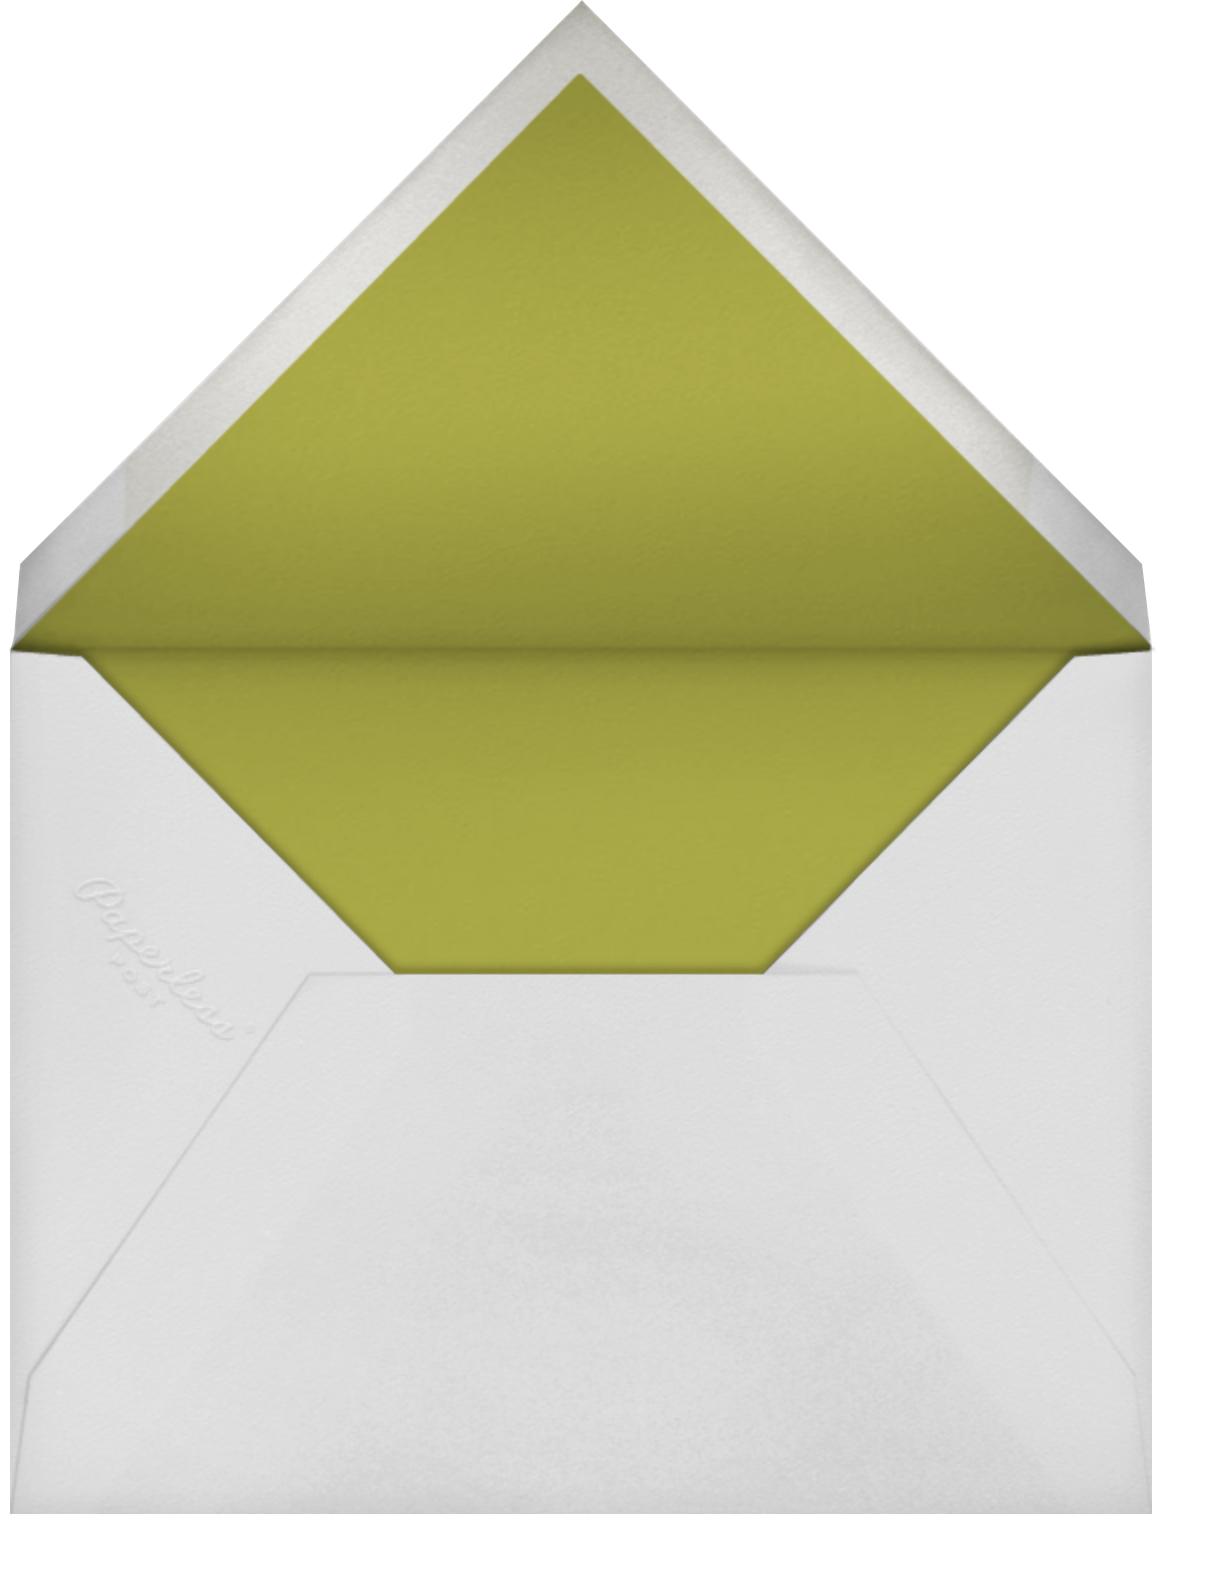 Let's Hang - White - Rifle Paper Co. - Virtual parties - envelope back